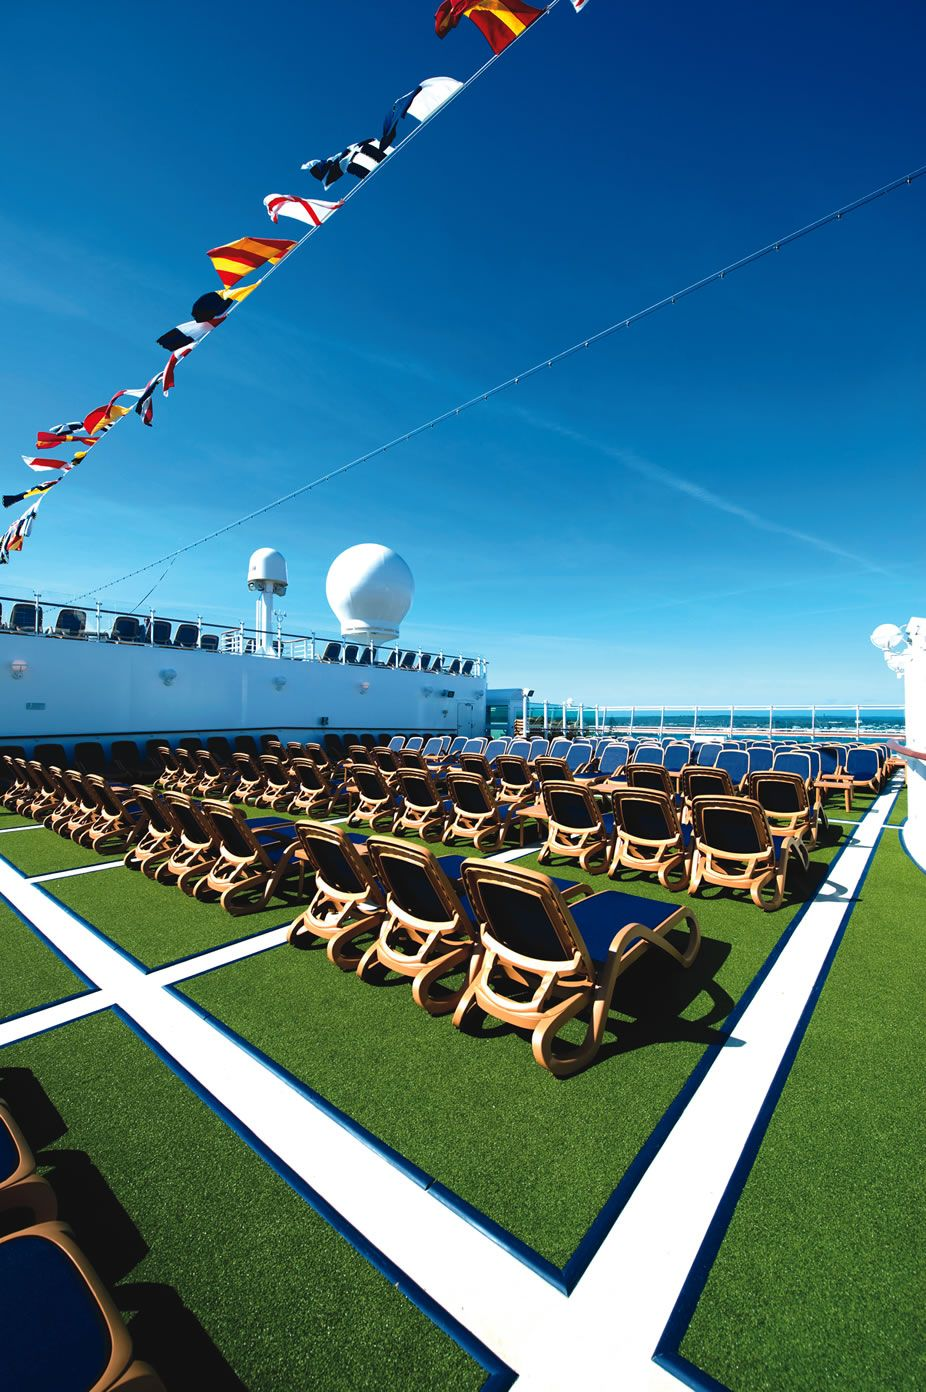 Deckchairs on top deck of po cruises azura find out more at deckchairs on top deck of po cruises azura find out more at http baanklon Image collections